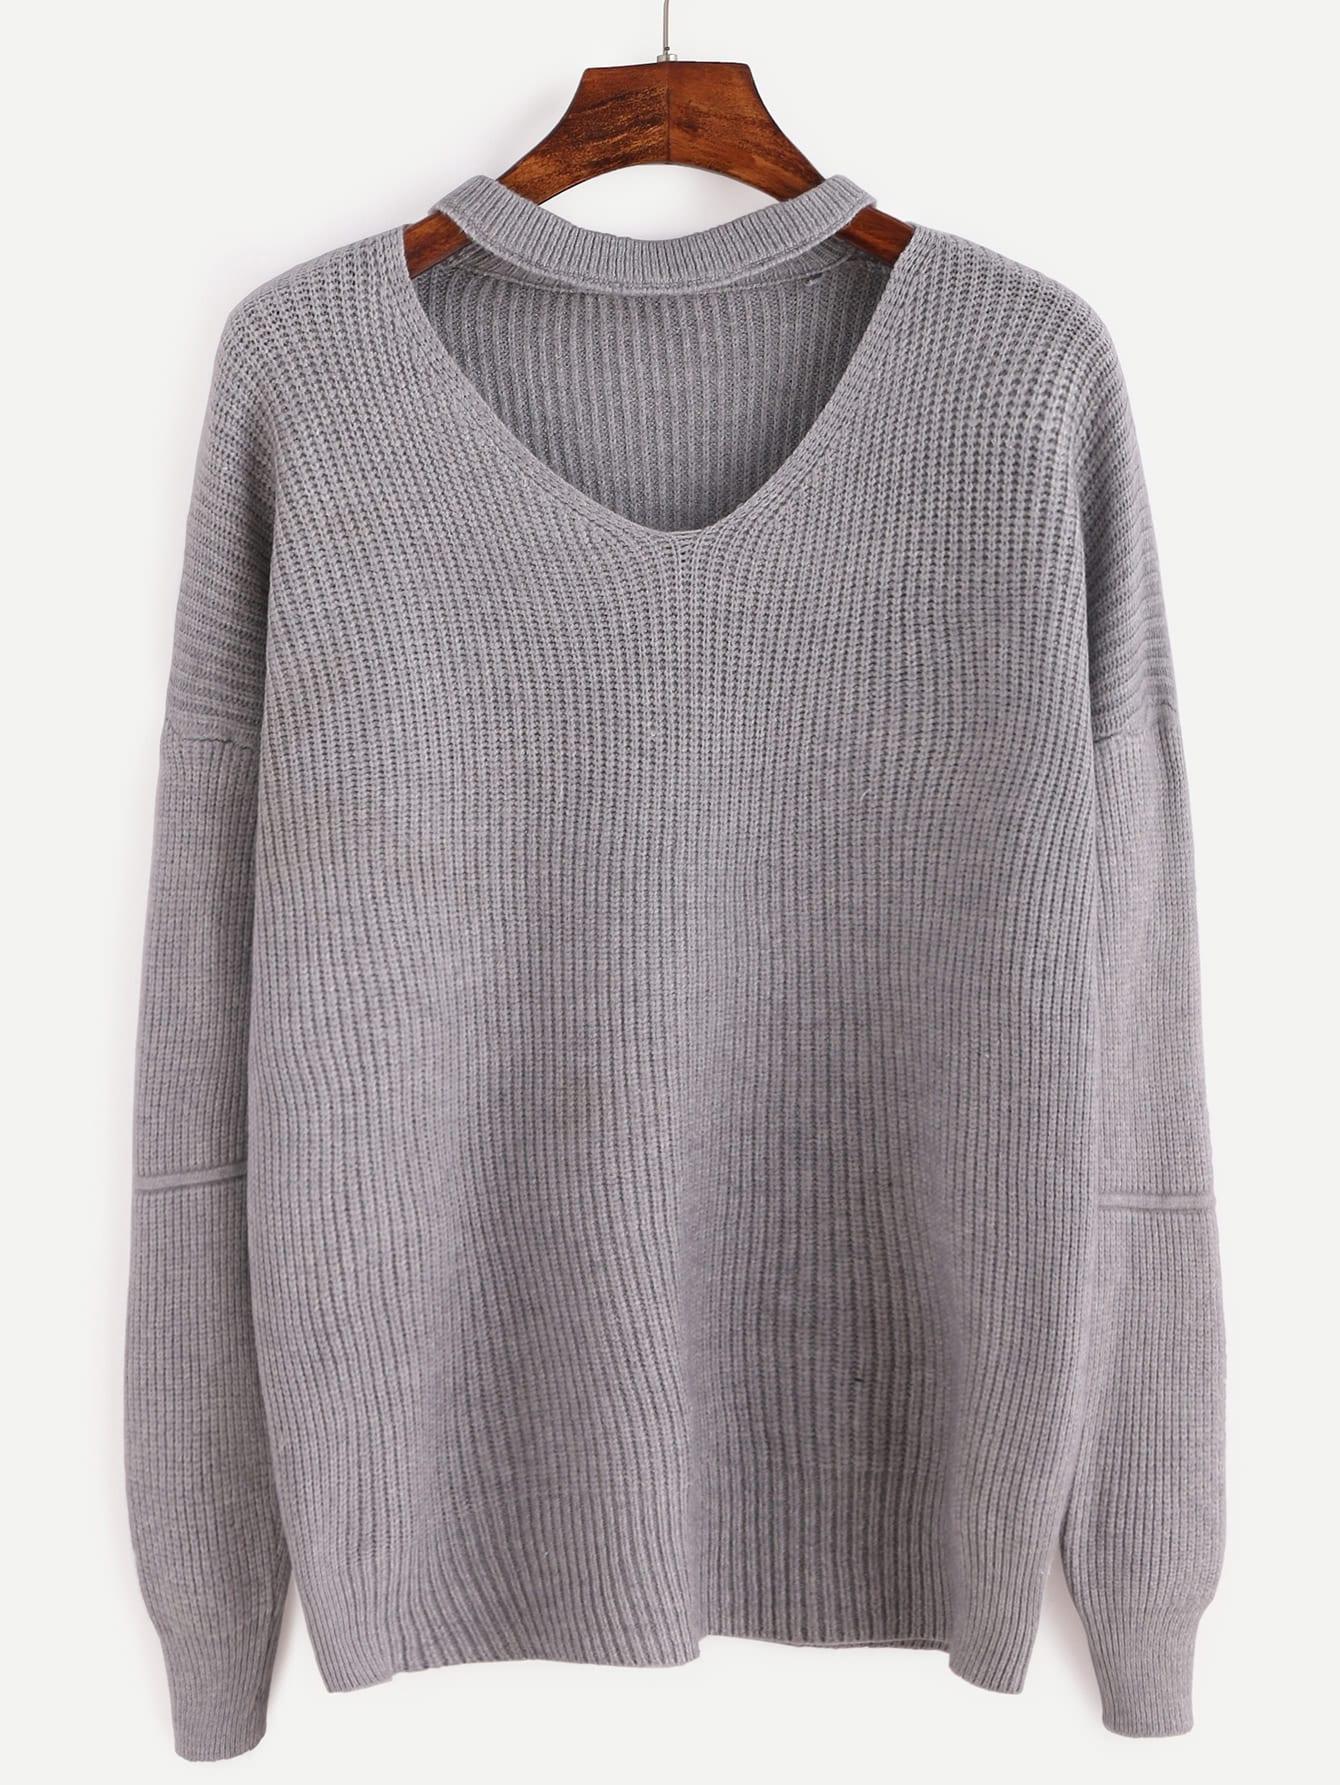 sweater161012004_2